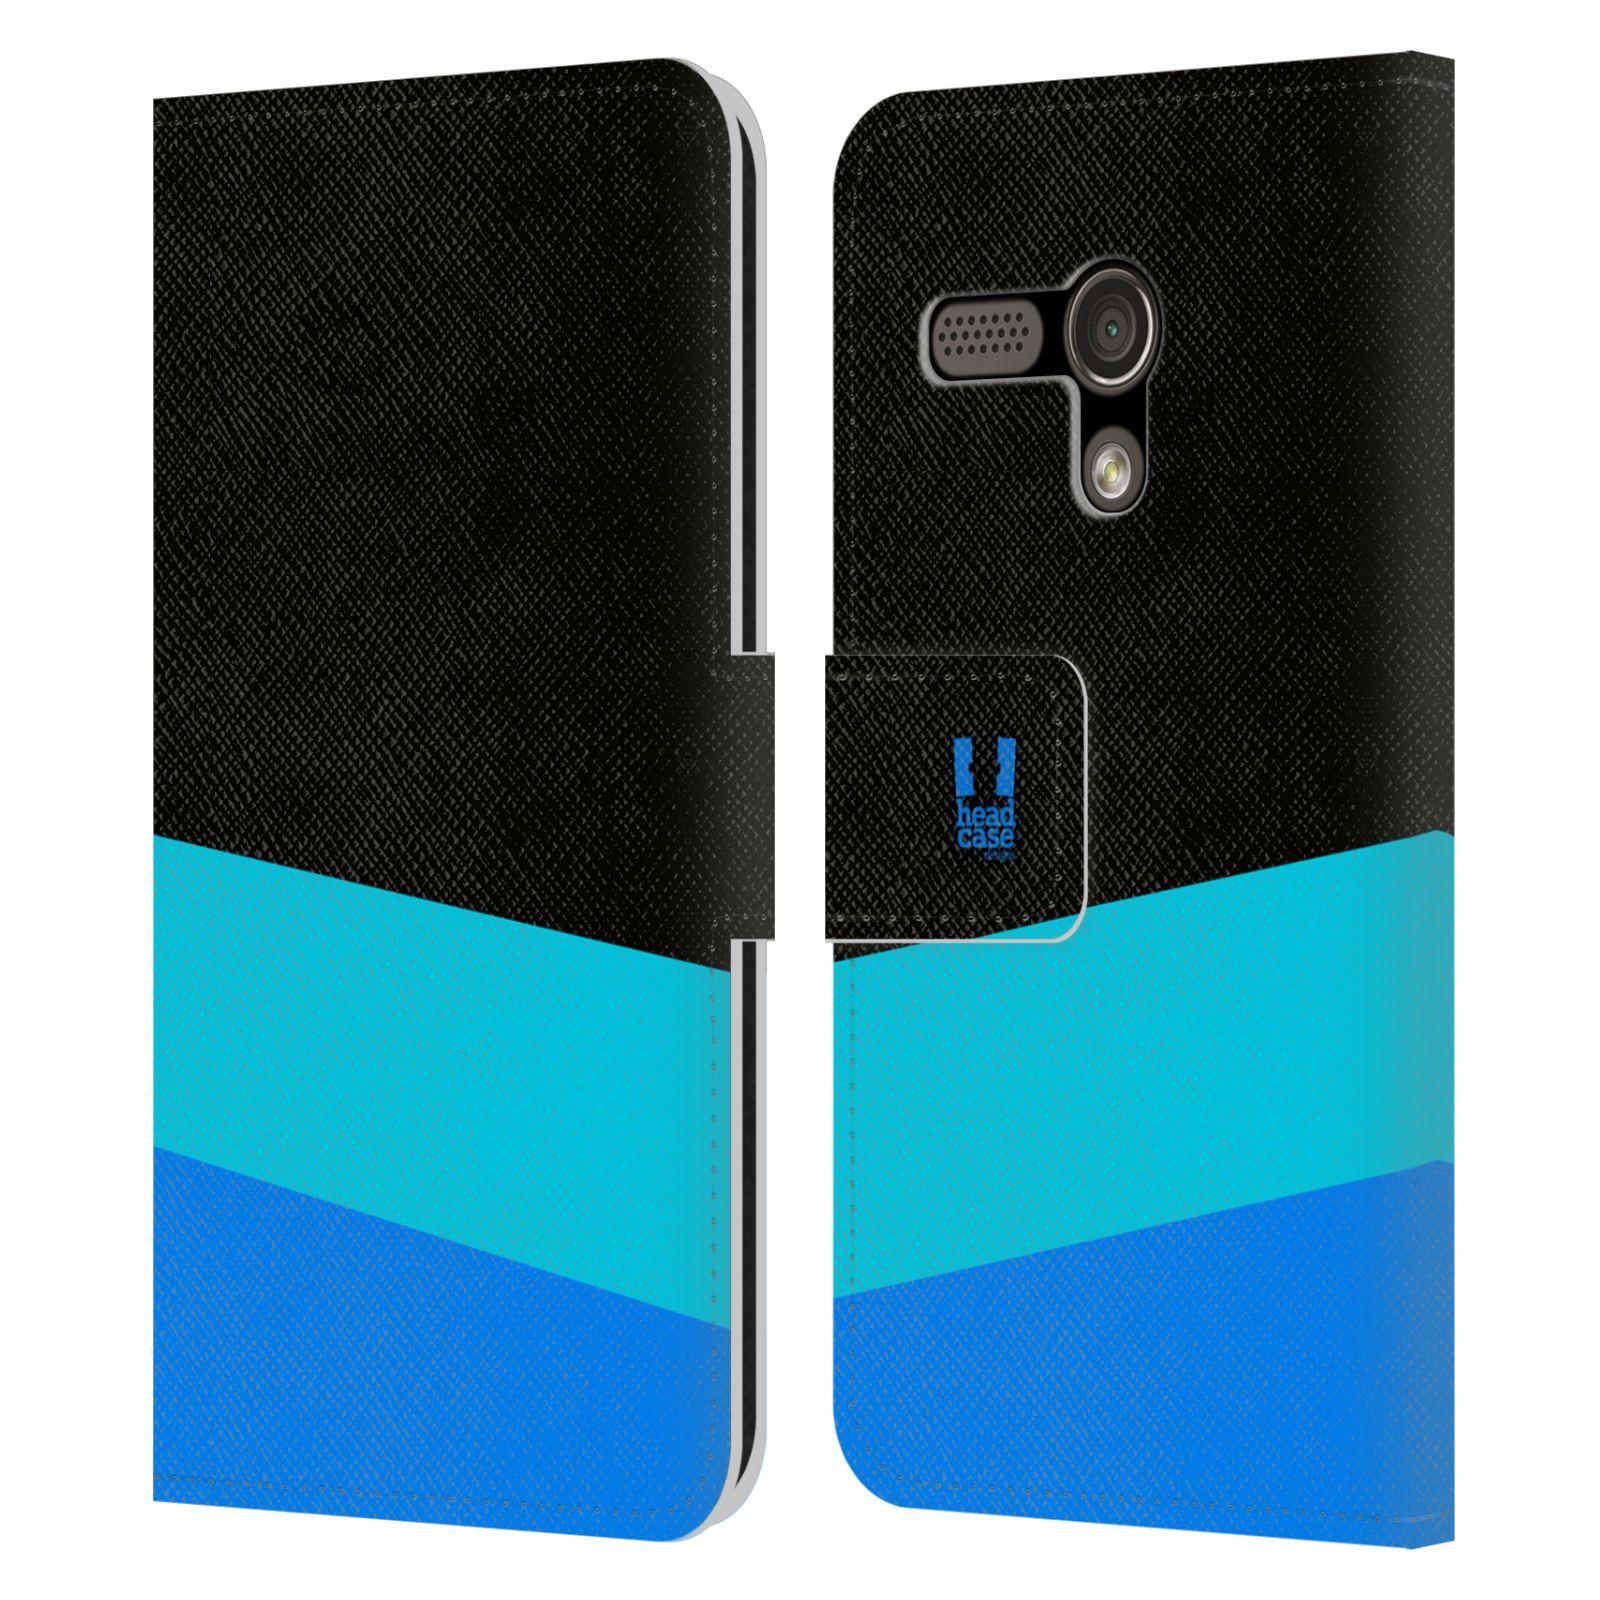 HEAD CASE Flipové pouzdro pro mobil Motorola MOTO G barevné tvary modrá a černá FORMAL